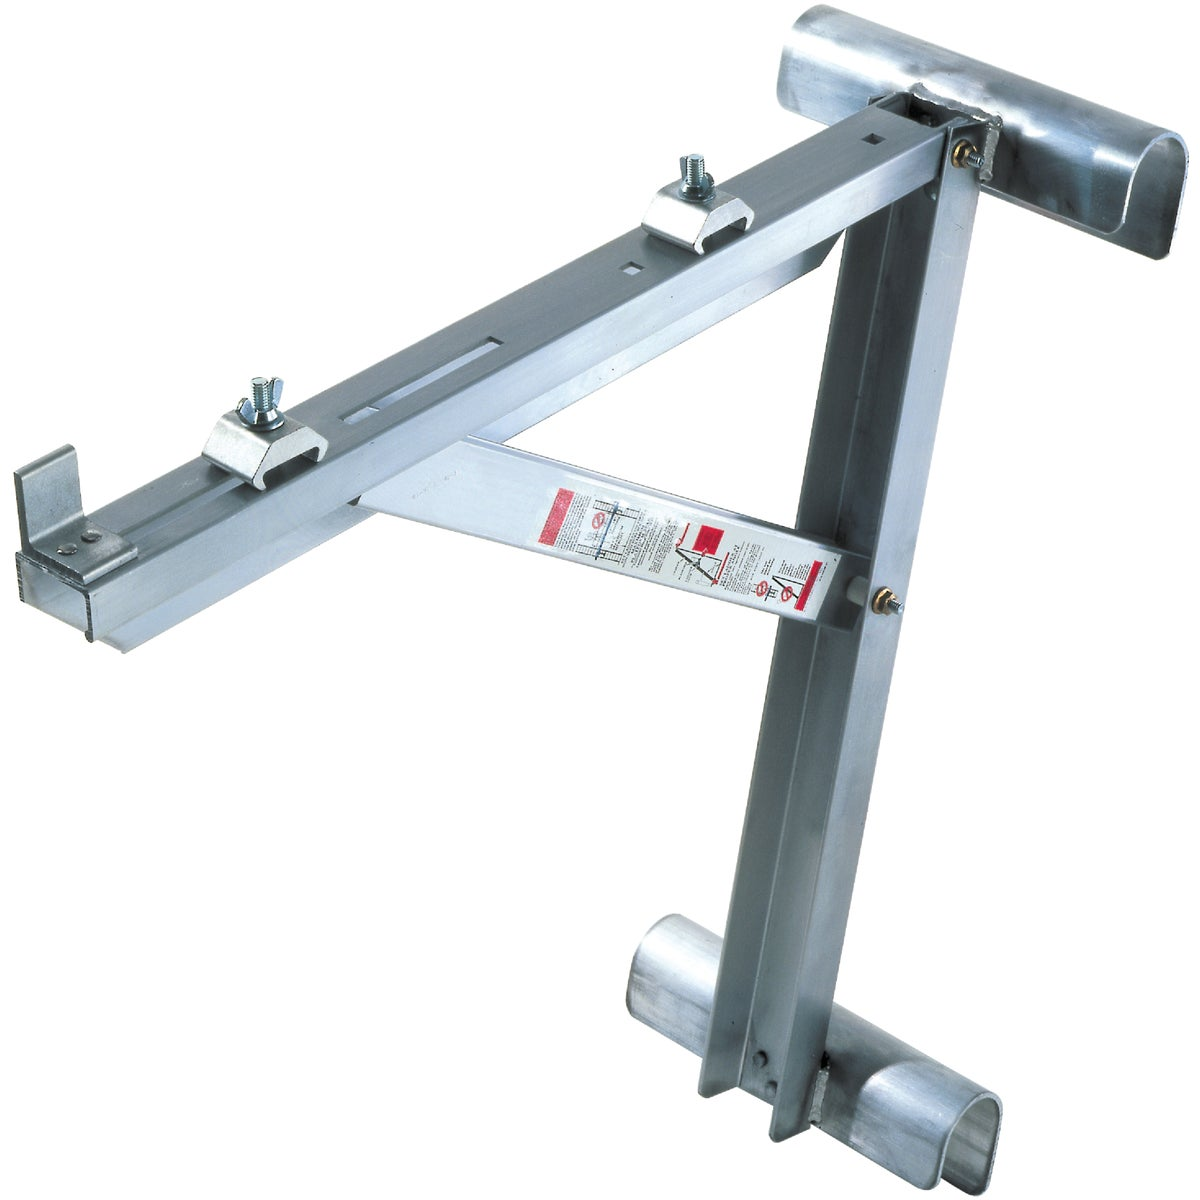 Werner Ac10 14 02 Aluminum Ladder Jacks Ebay